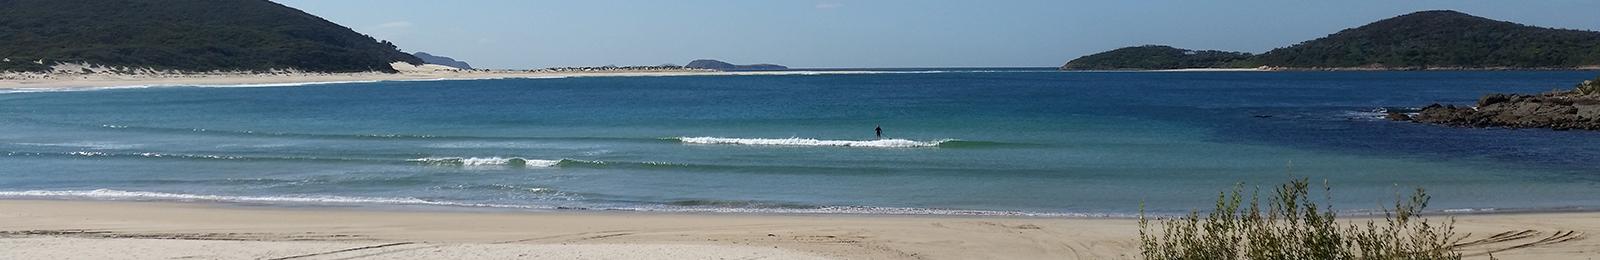 Fingal Bay banner image